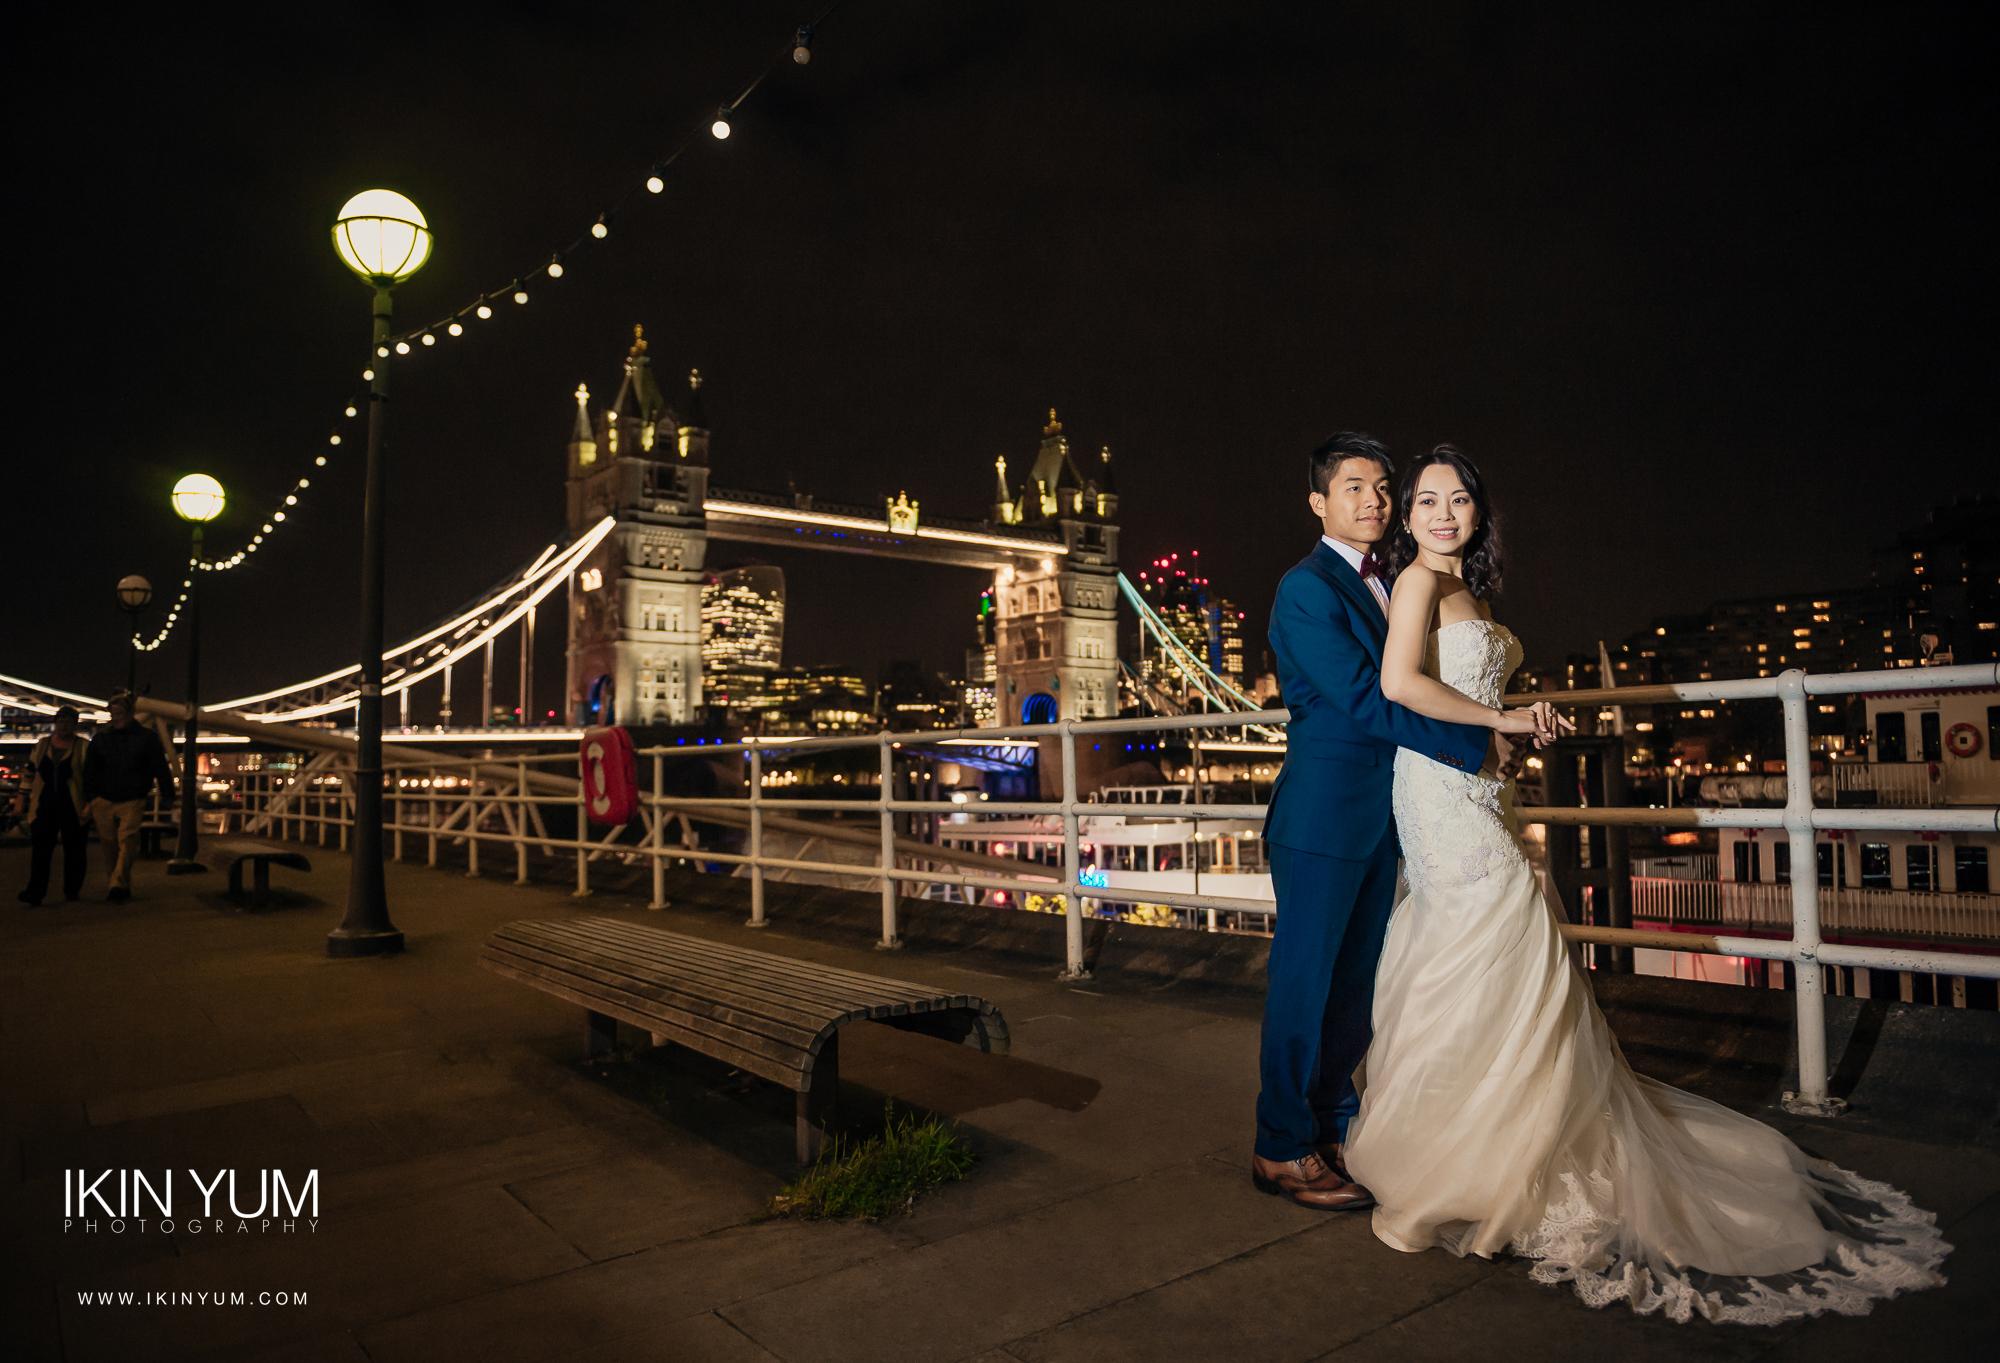 Chloe & Carlos Pre-Wedding Shoot- Ikin Yum Photography-0161.jpg